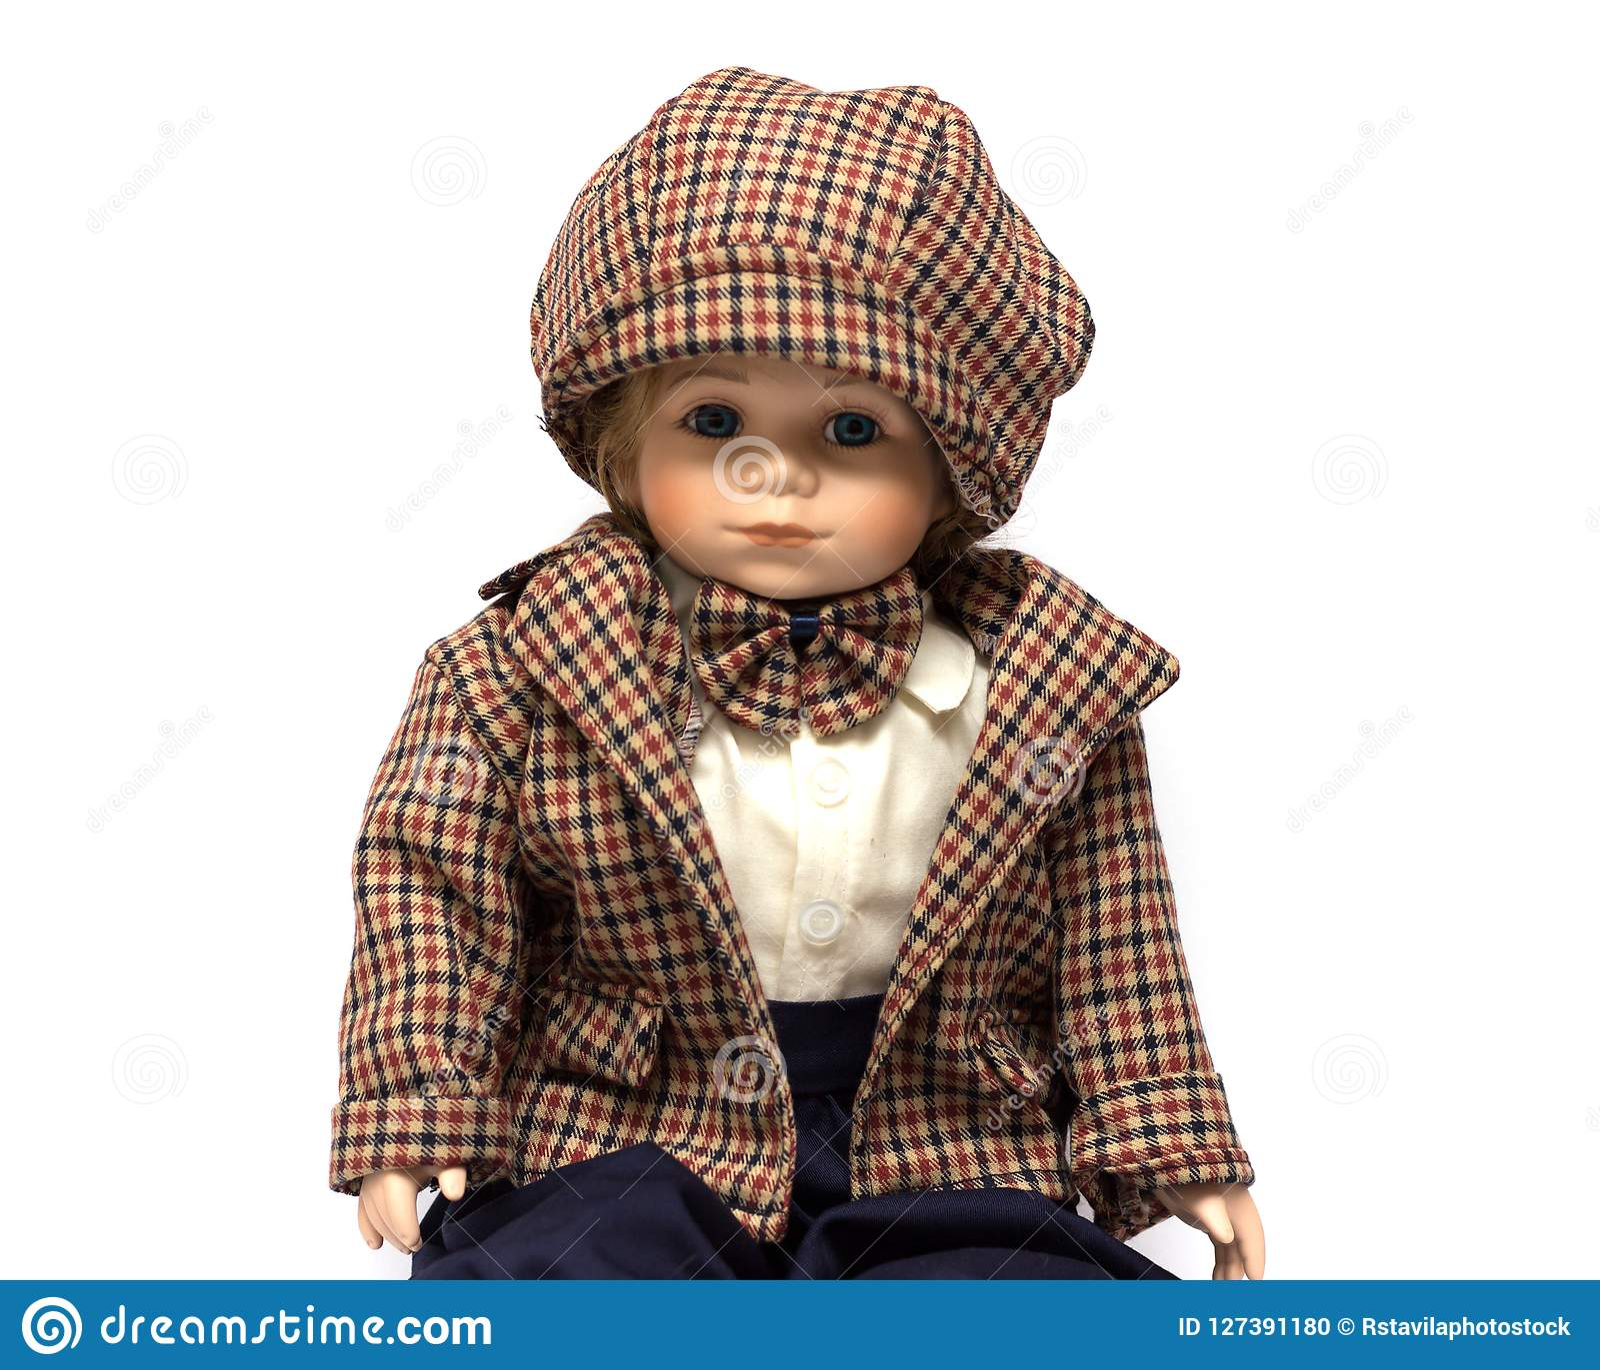 Ceramic porcelain handmade vintage doll of brunette boy with curly hair.